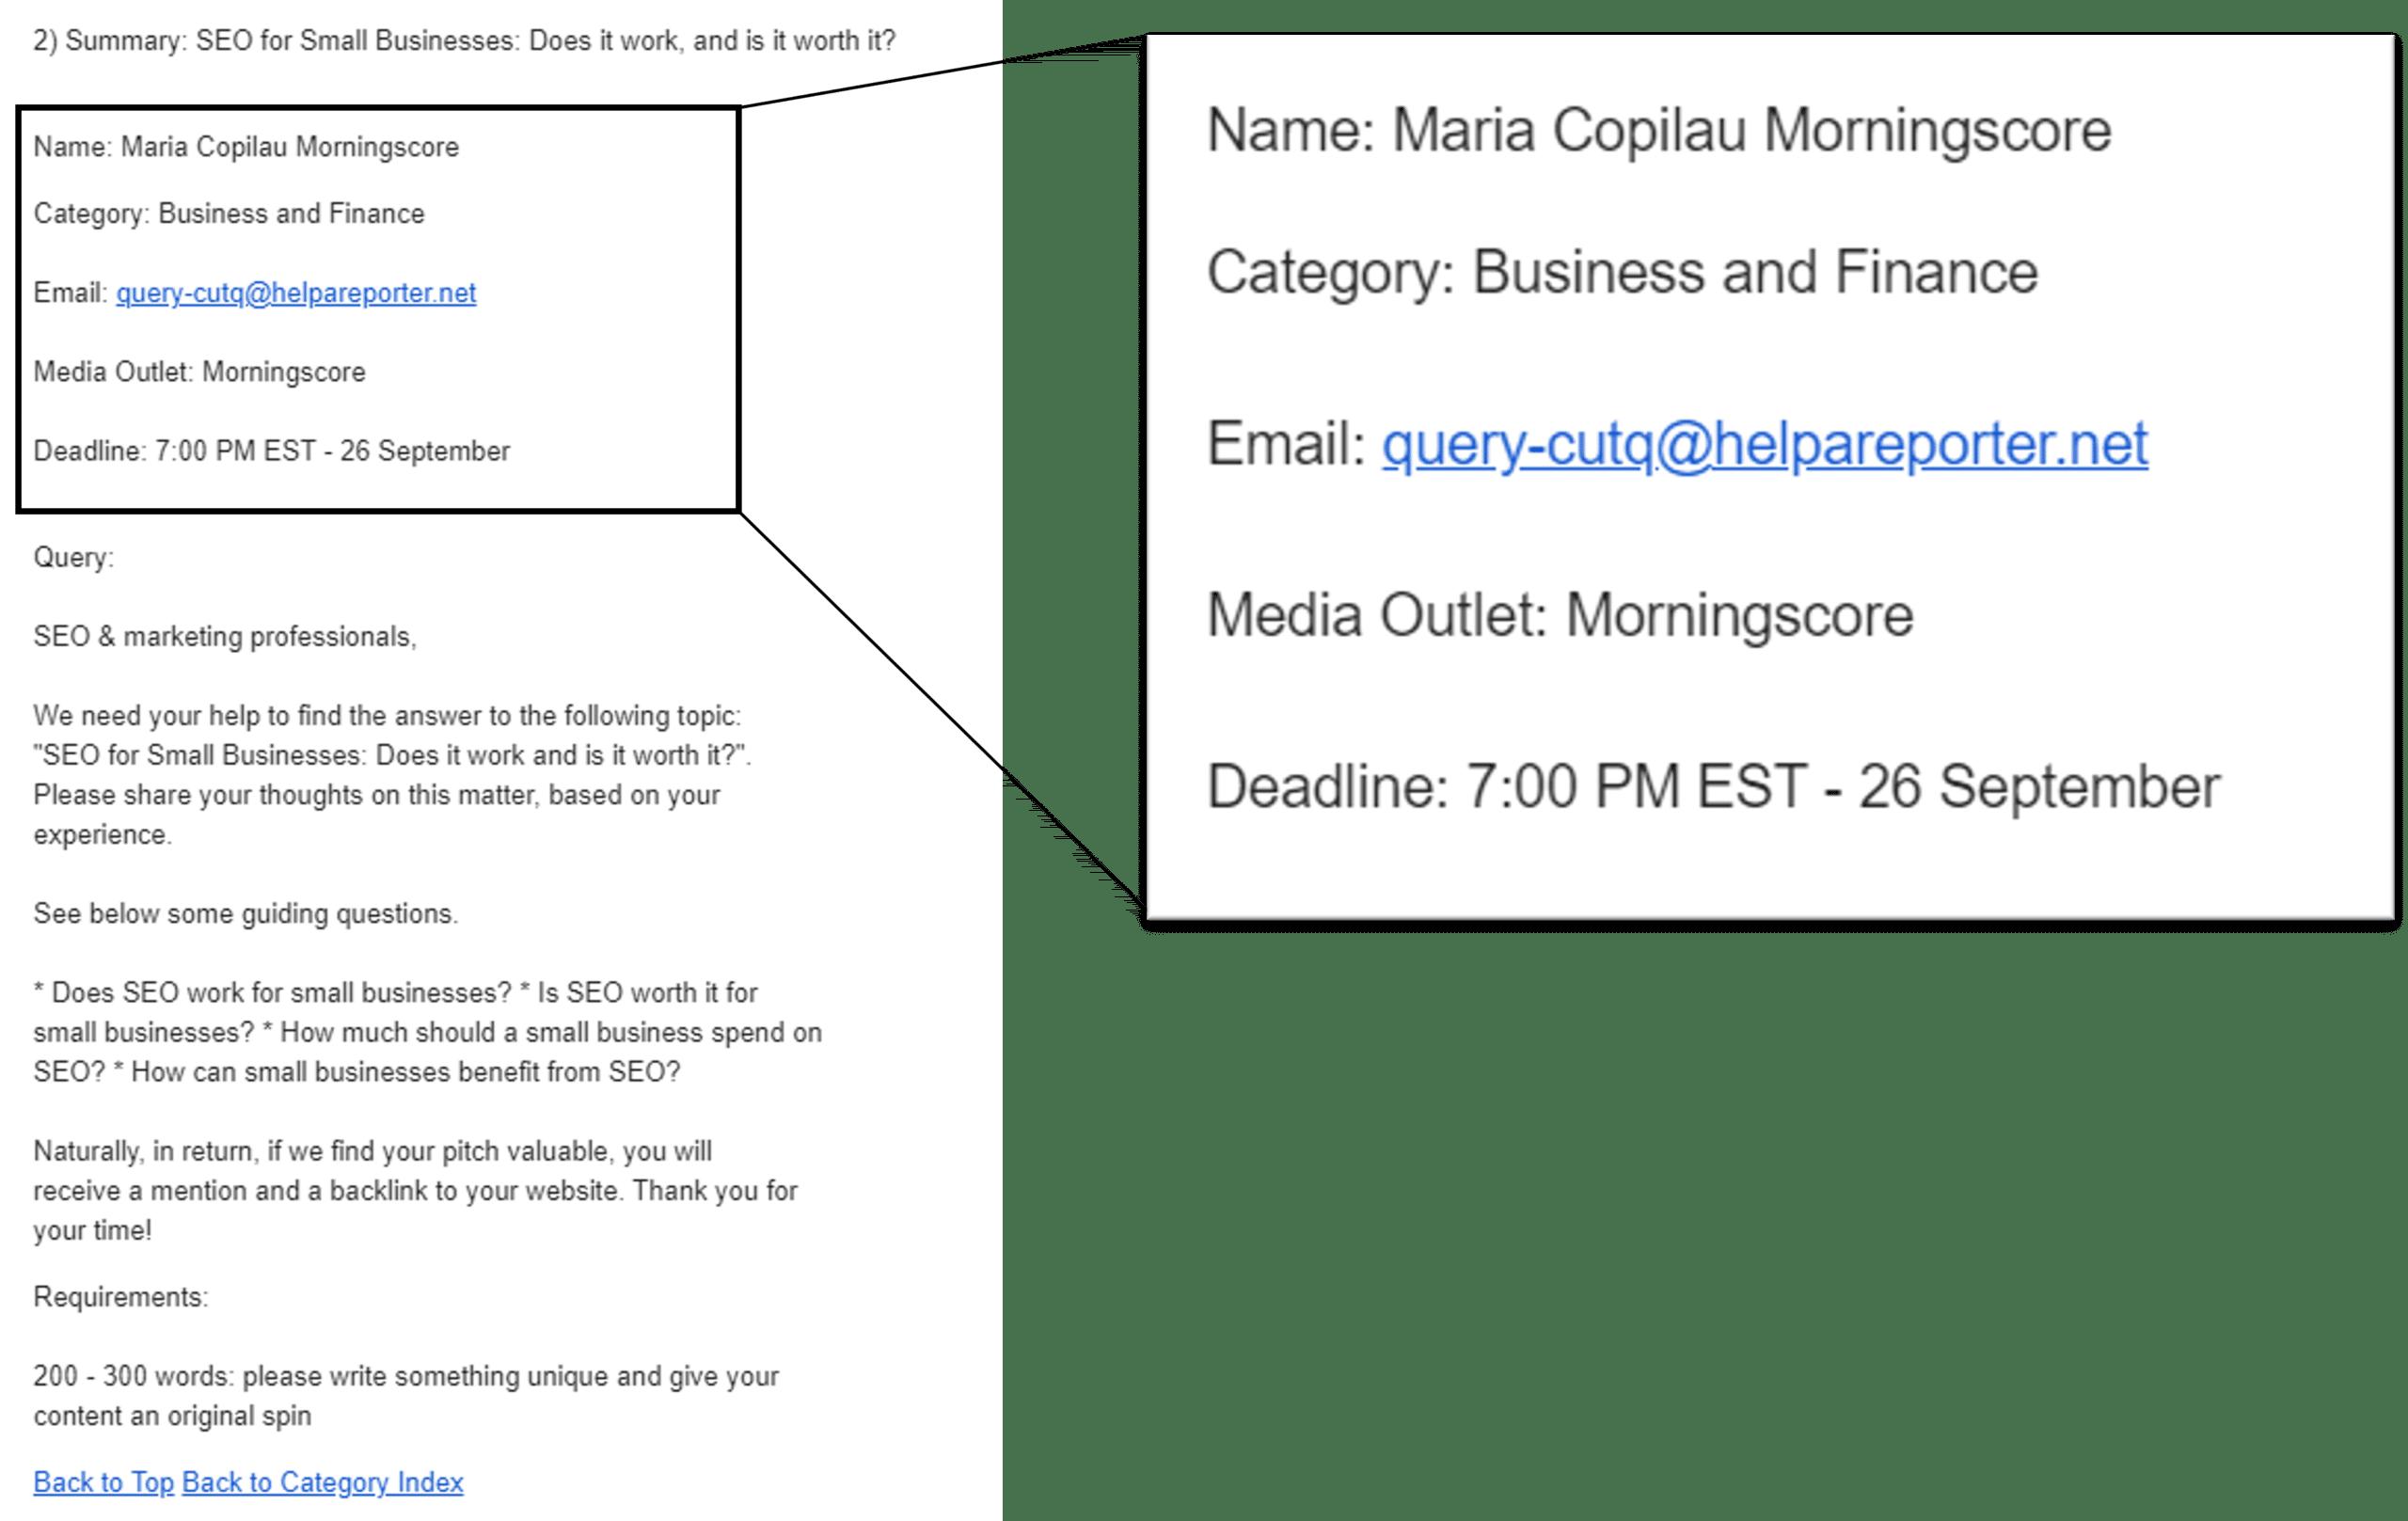 HARO query information deadline